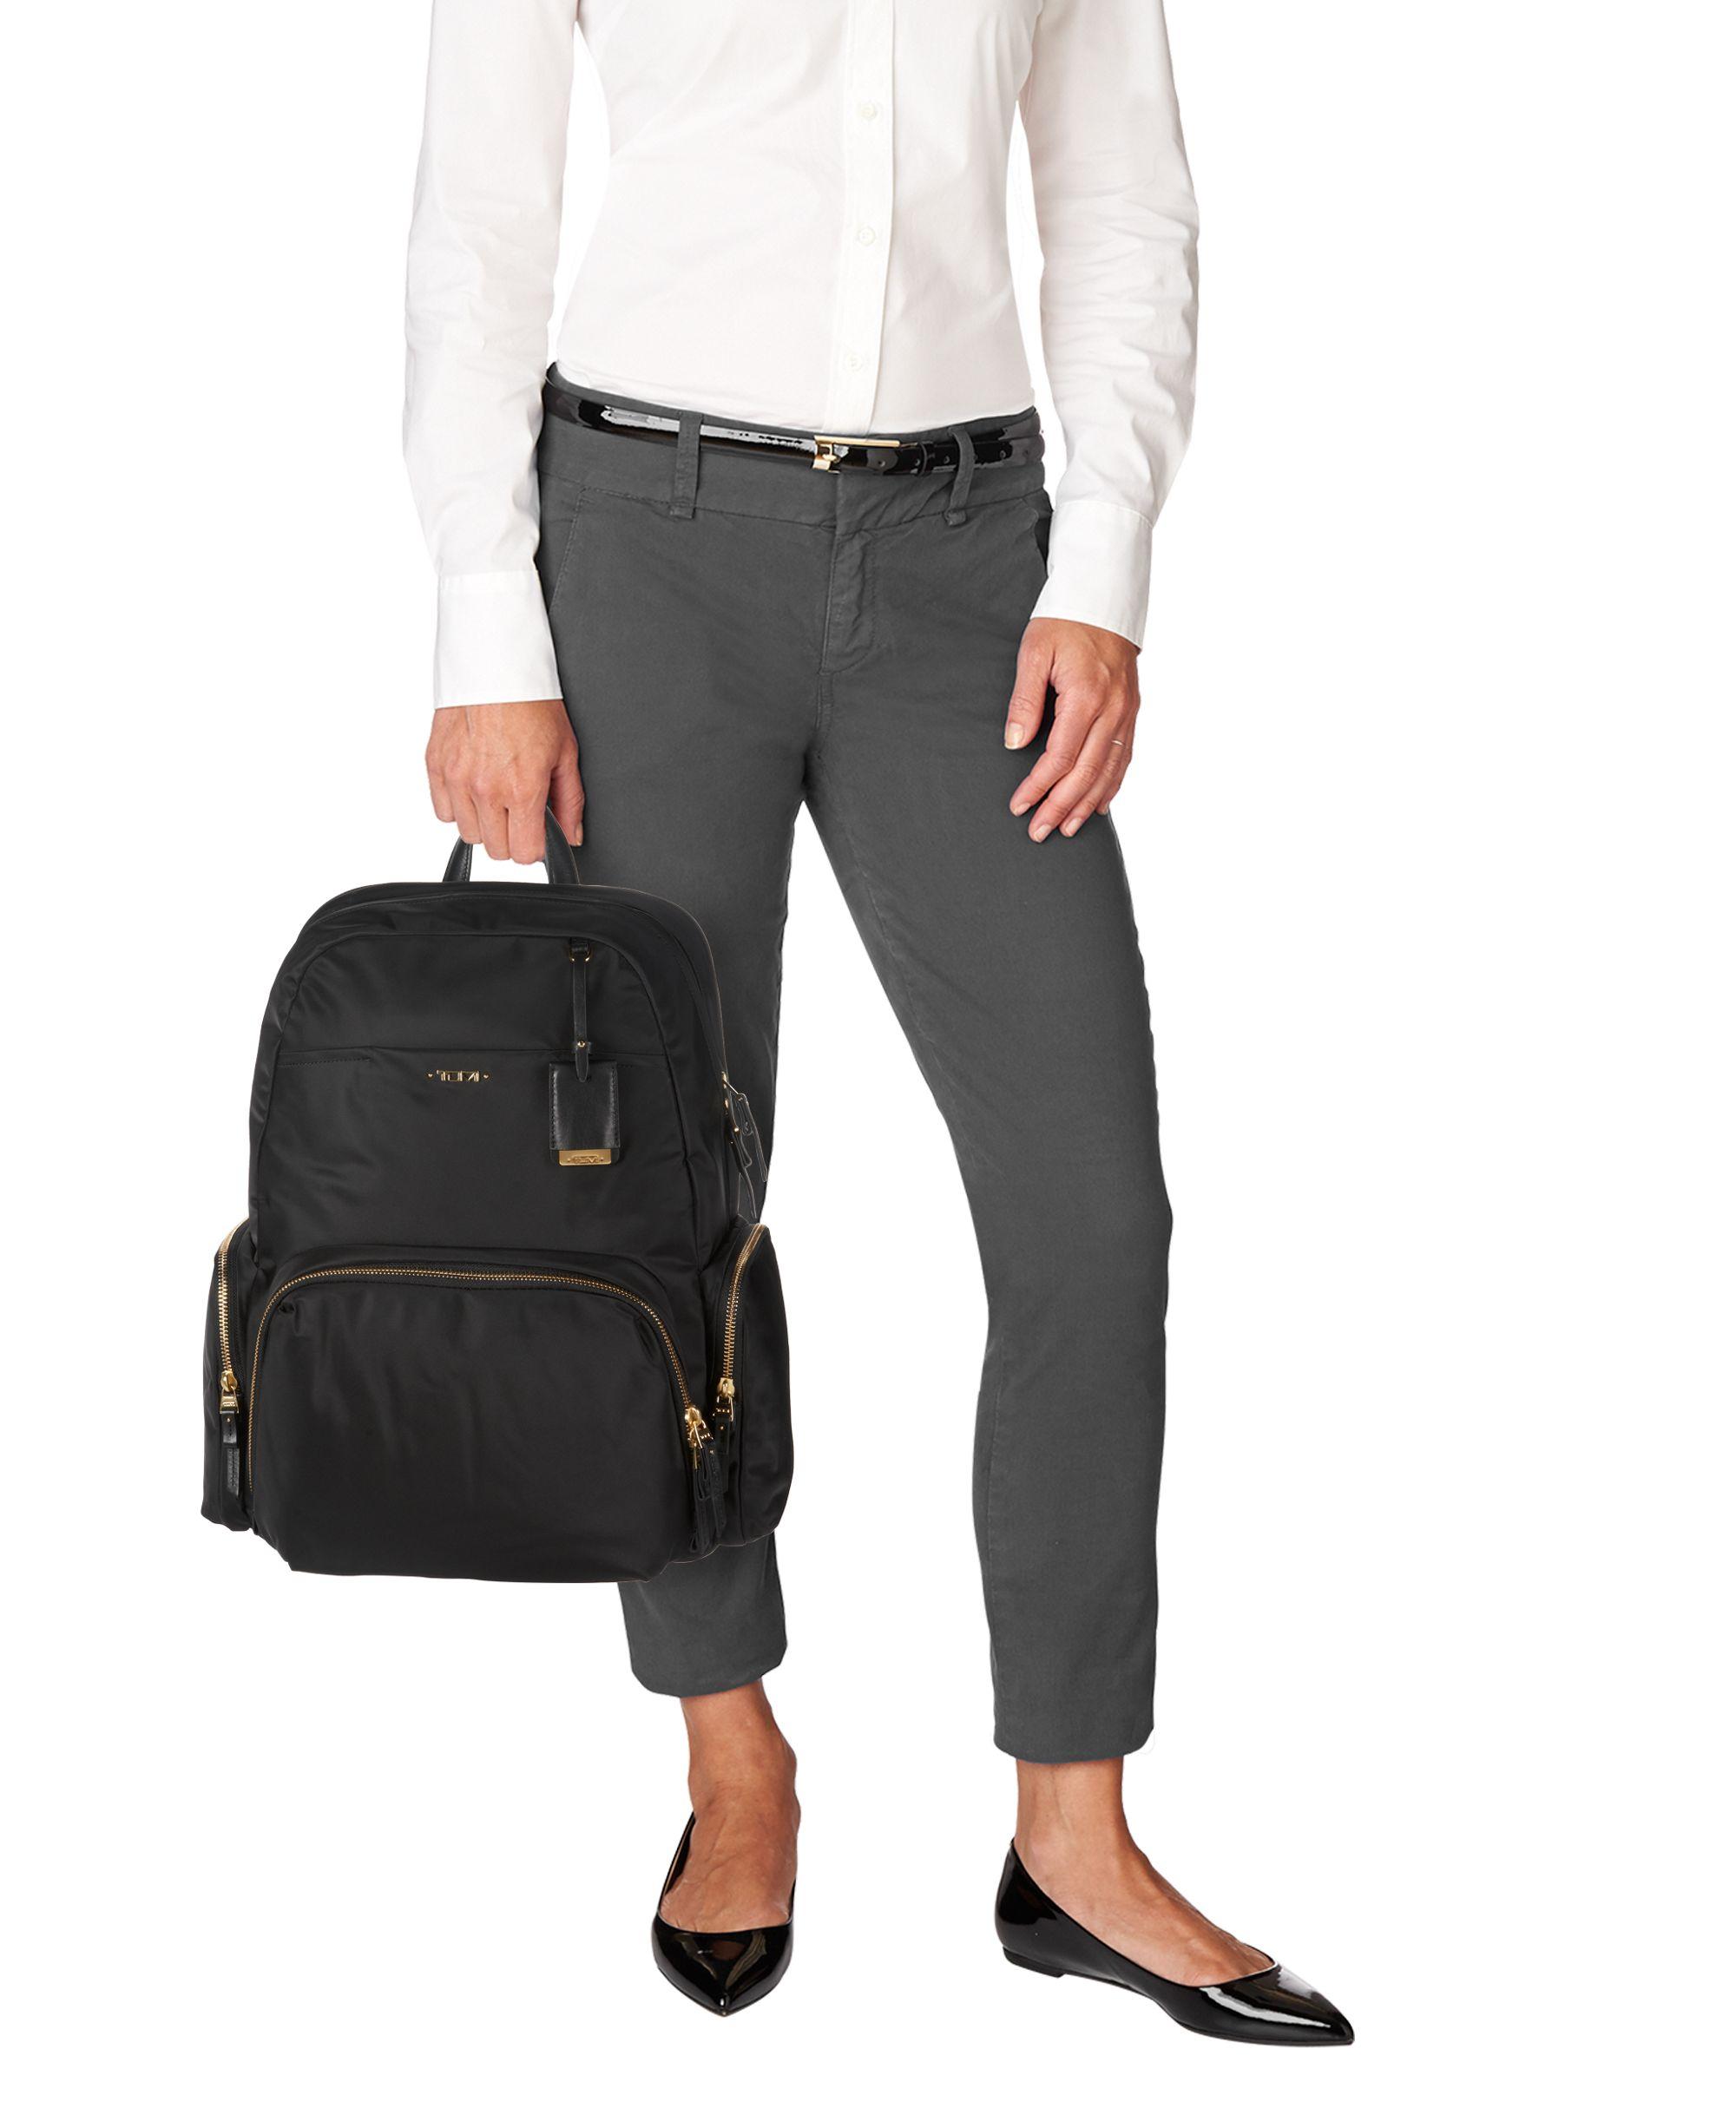 calais backpack voyageur tumi united states